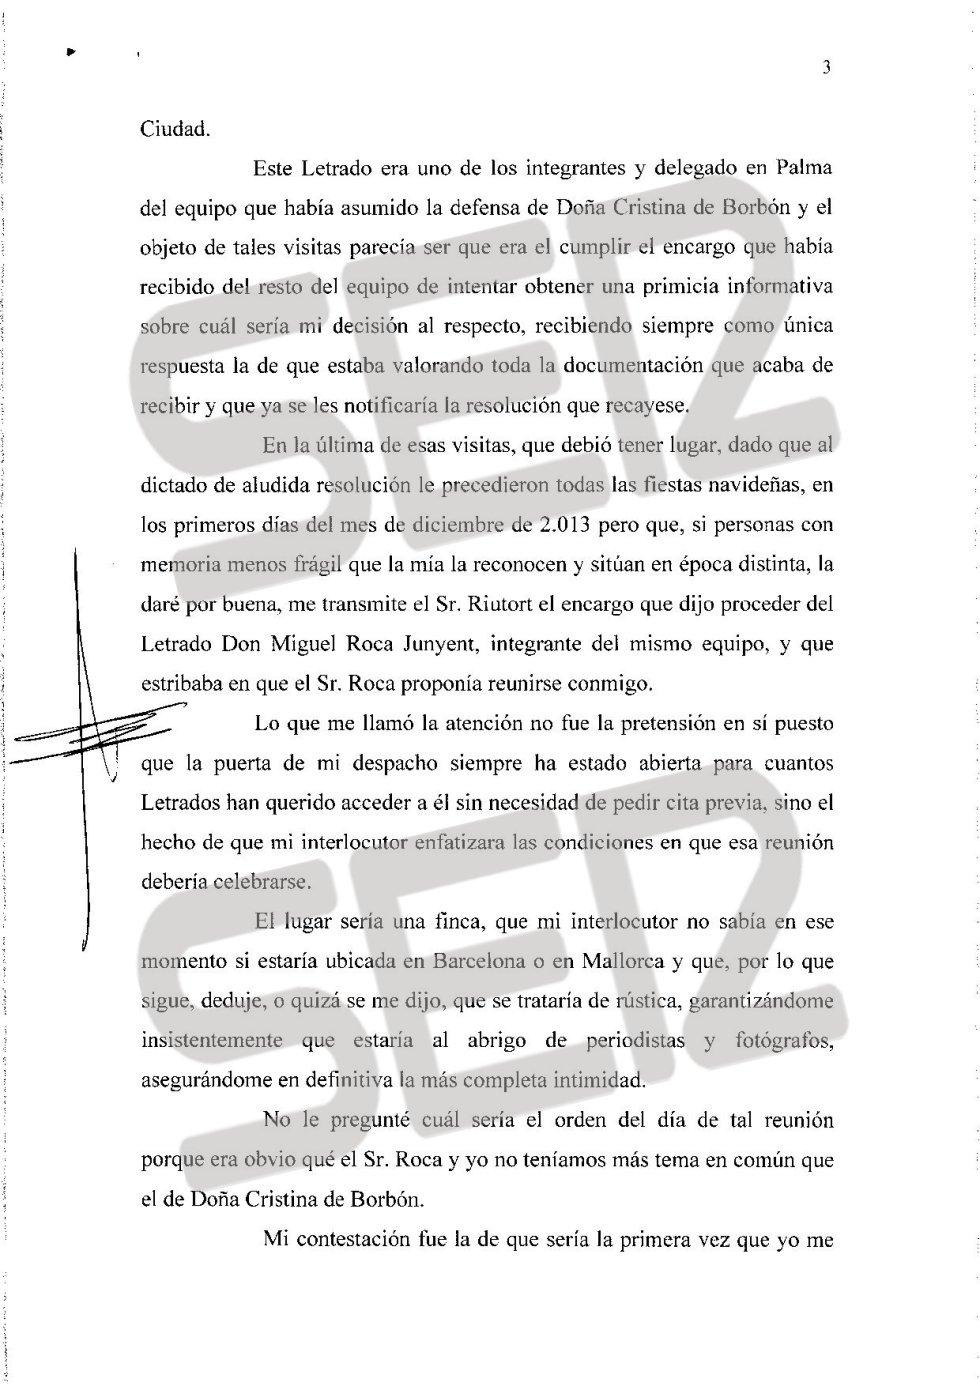 Carta íntegra de José Castro a Santiago Pedraz (página 3/6).